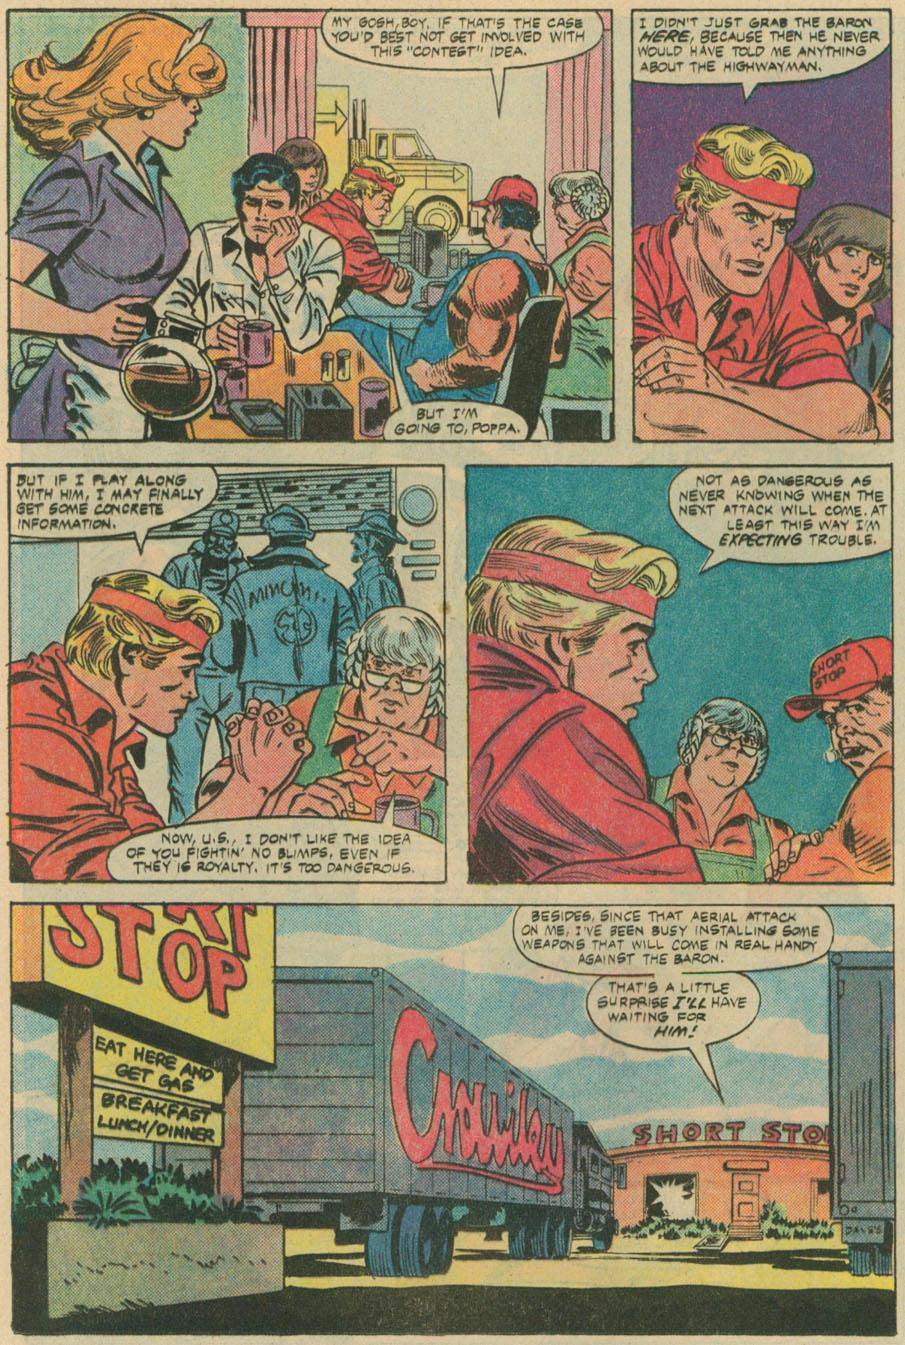 Read online U.S. 1 comic -  Issue #4 - 9